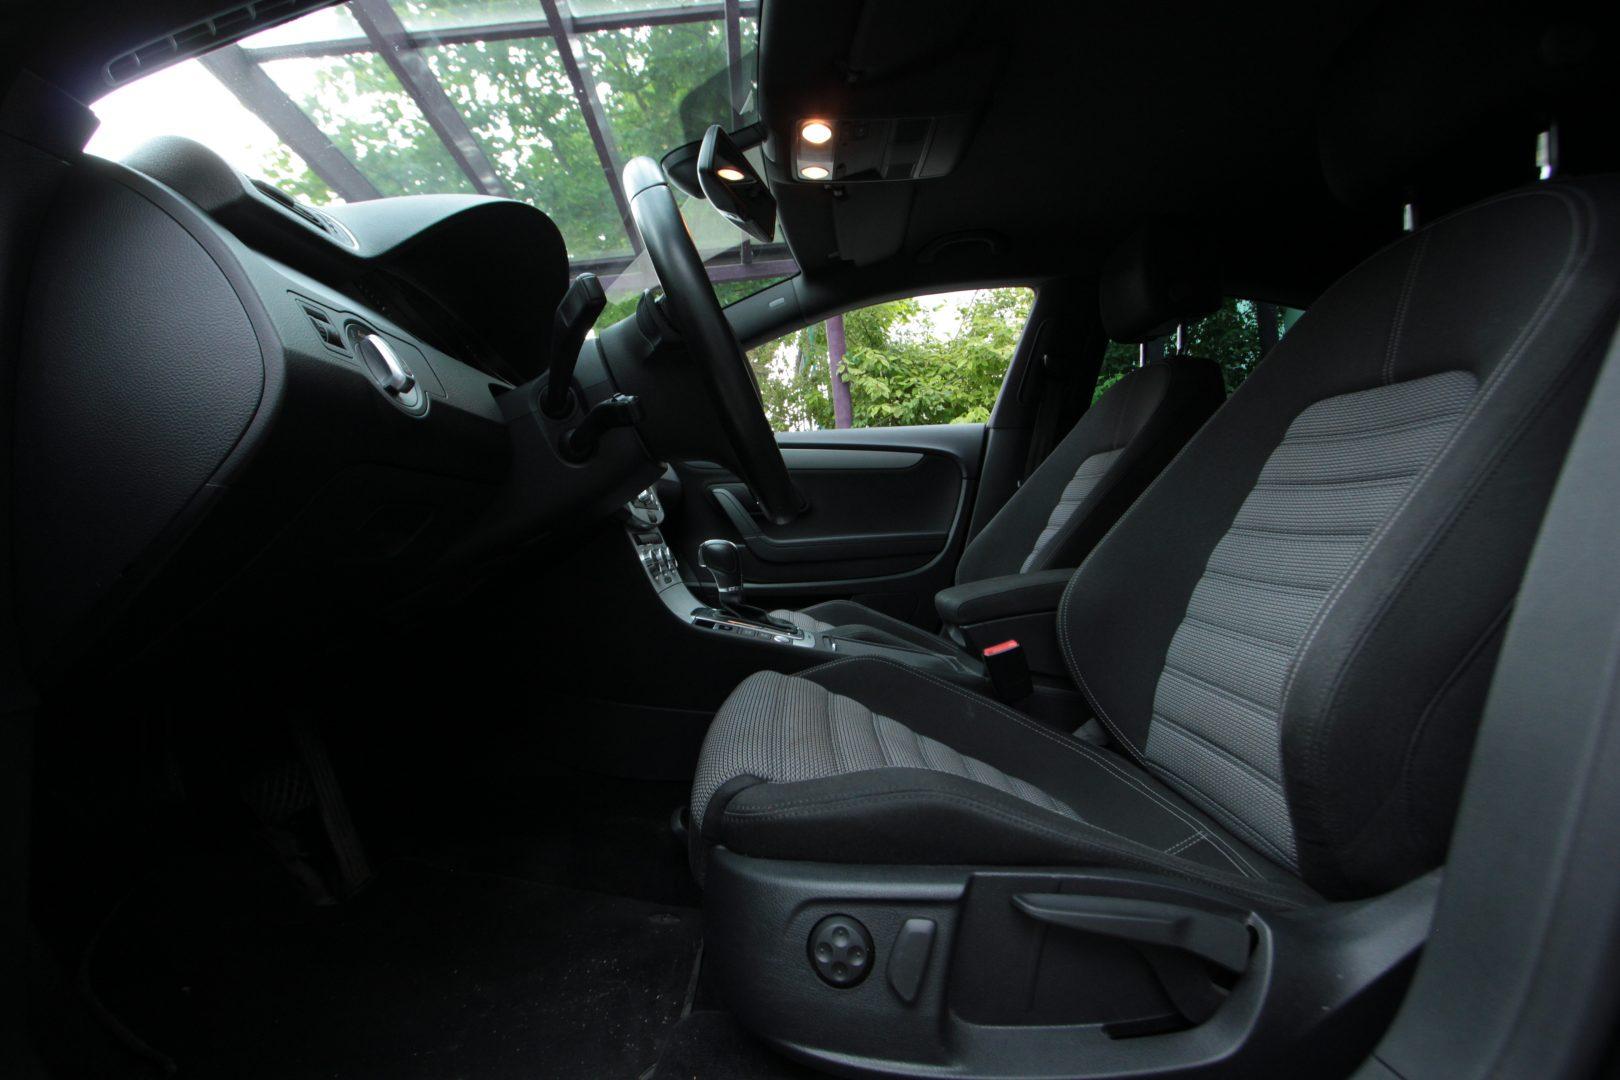 AIL VW CC 2.0TDI Basis BMT 4Motion DSG 12